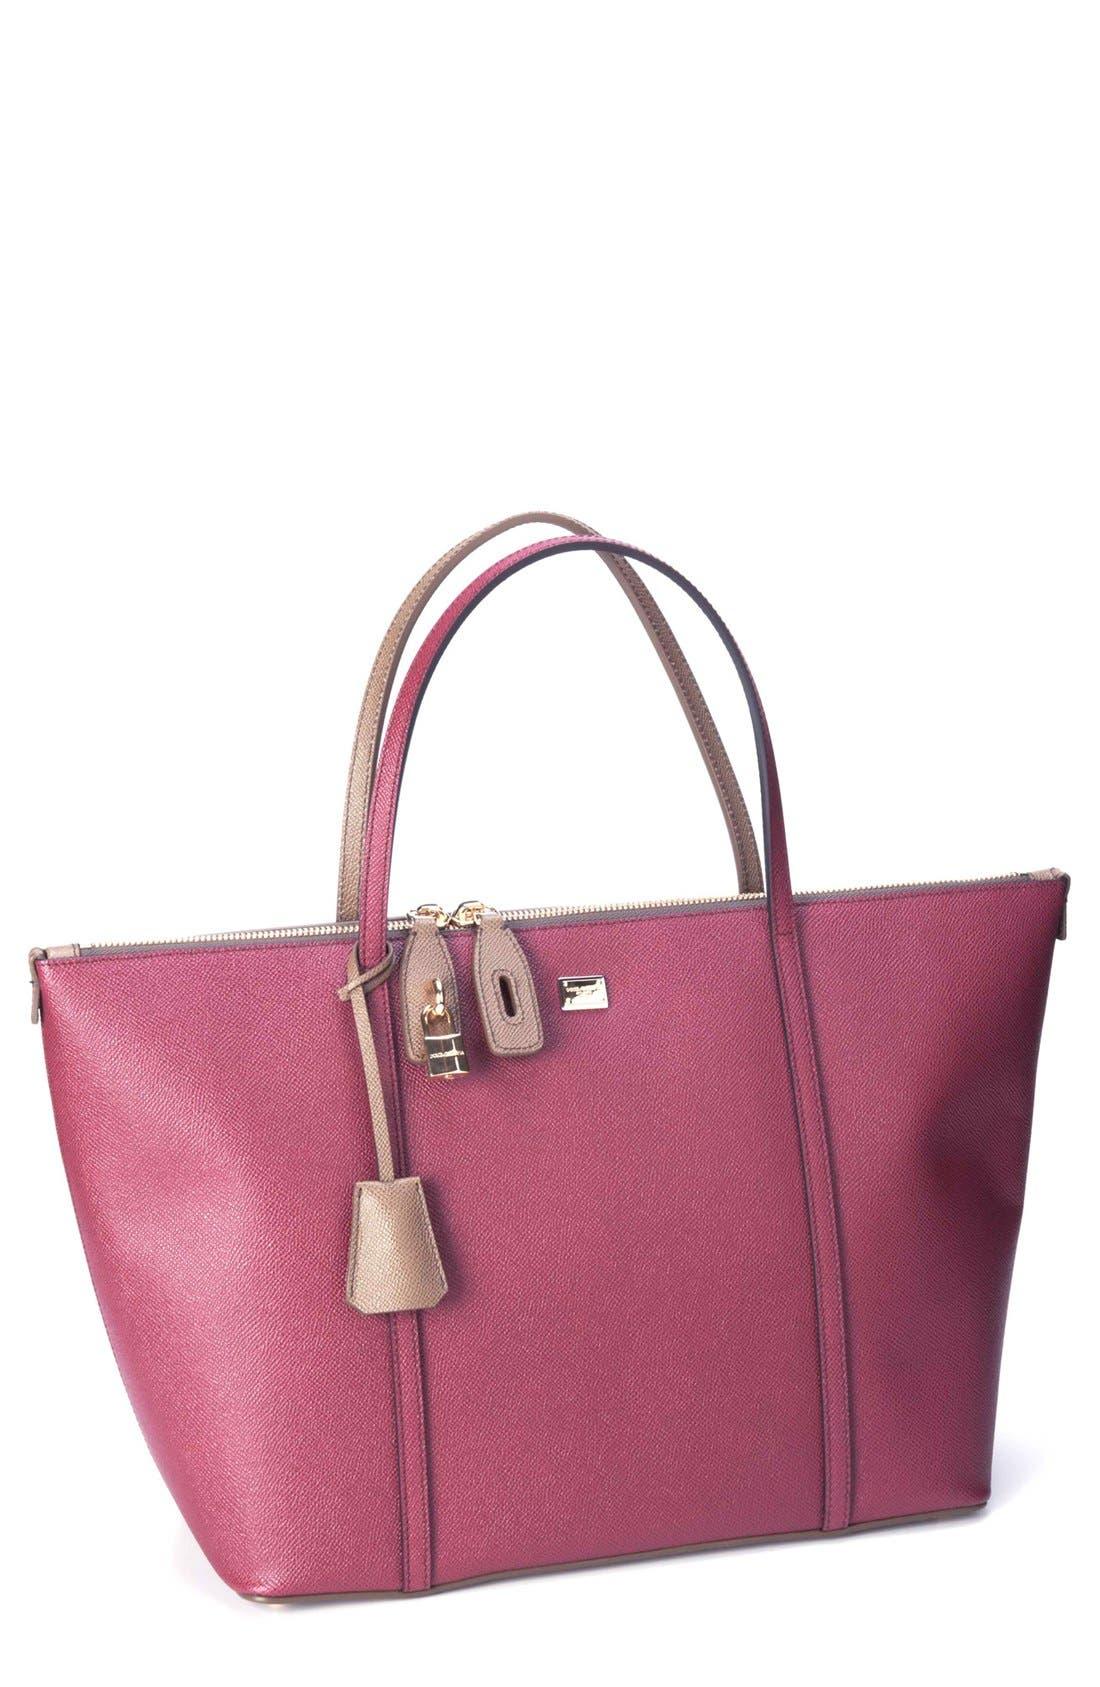 Main Image - Dolce&Gabbana 'Miss Escape' Leather Tote